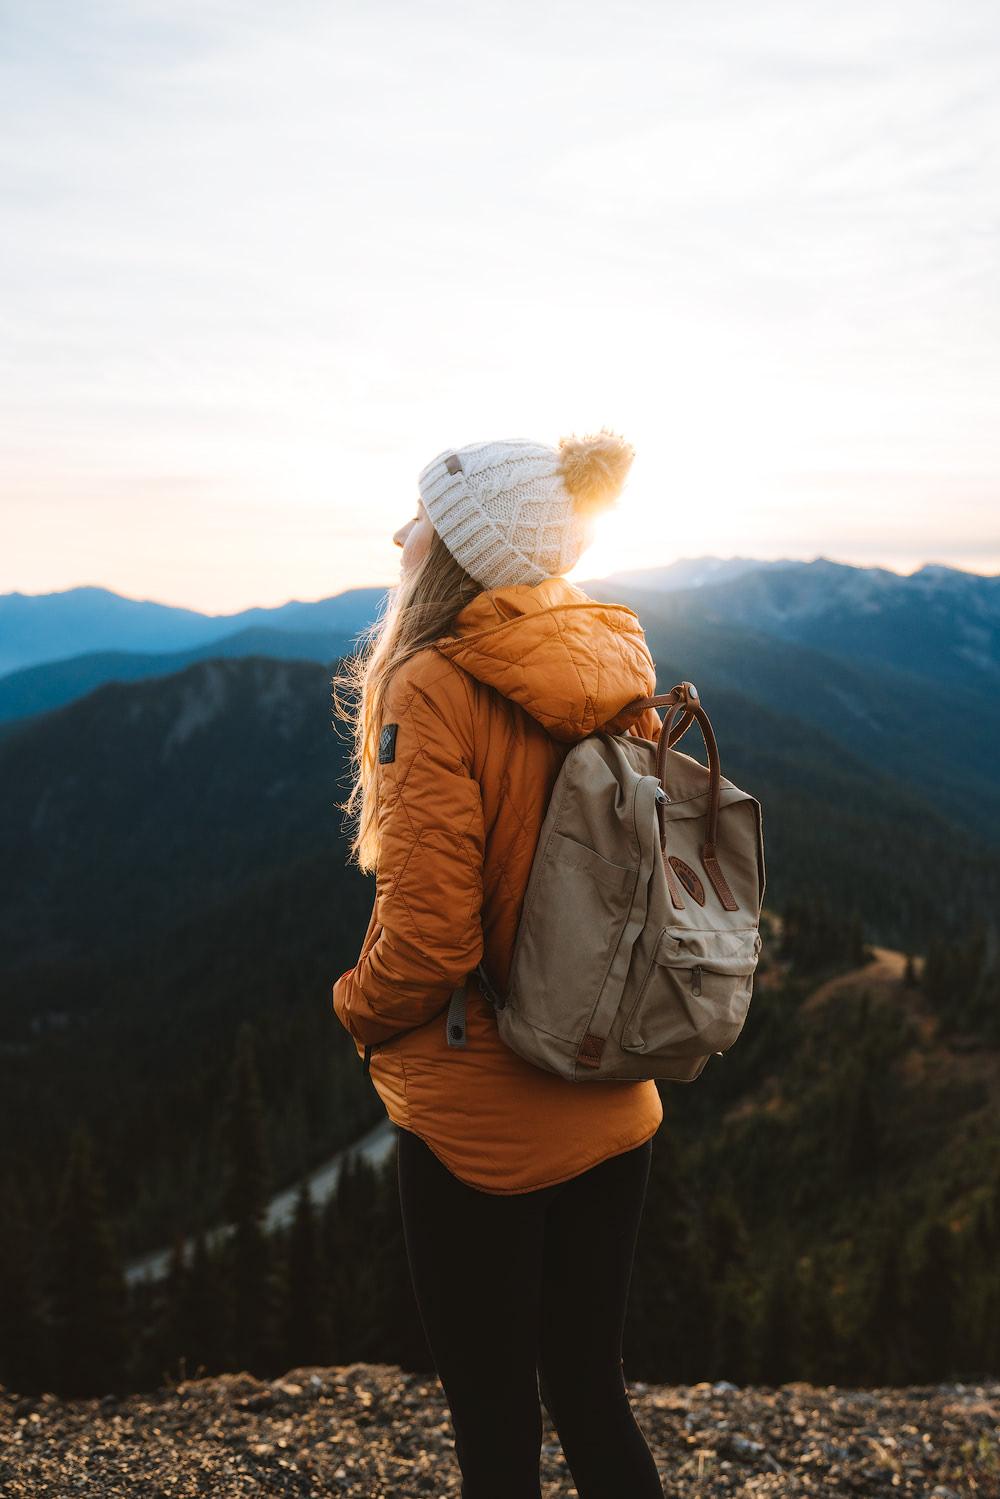 Olympic National Park Adventure Getaway 24 Hour Itinerary from Seattle Renee Roaming Hurricane Ridge Sunrise 4